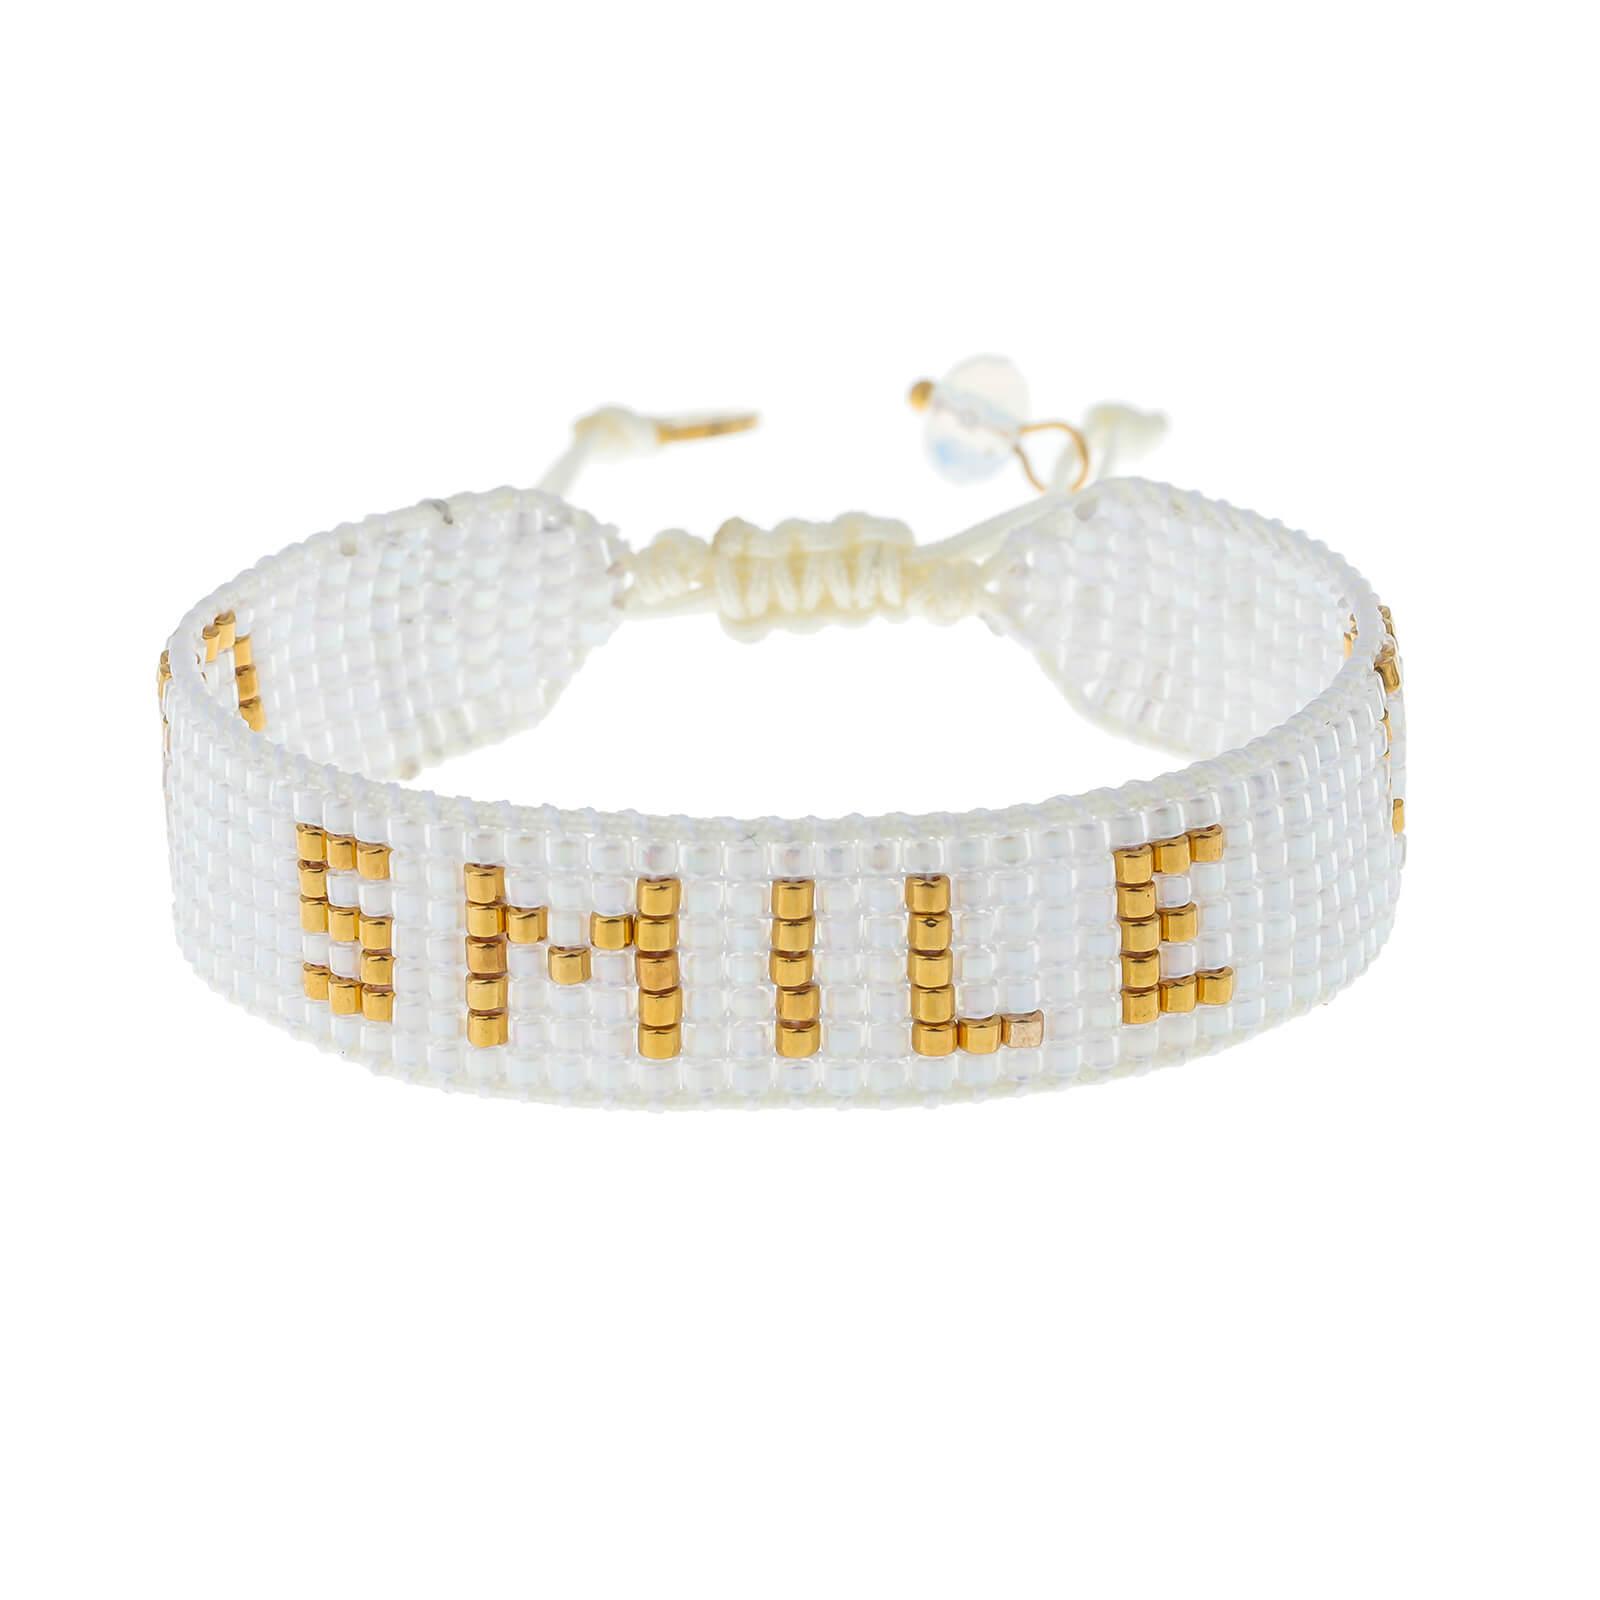 Letter Miyuki seed bead friendship bracelet